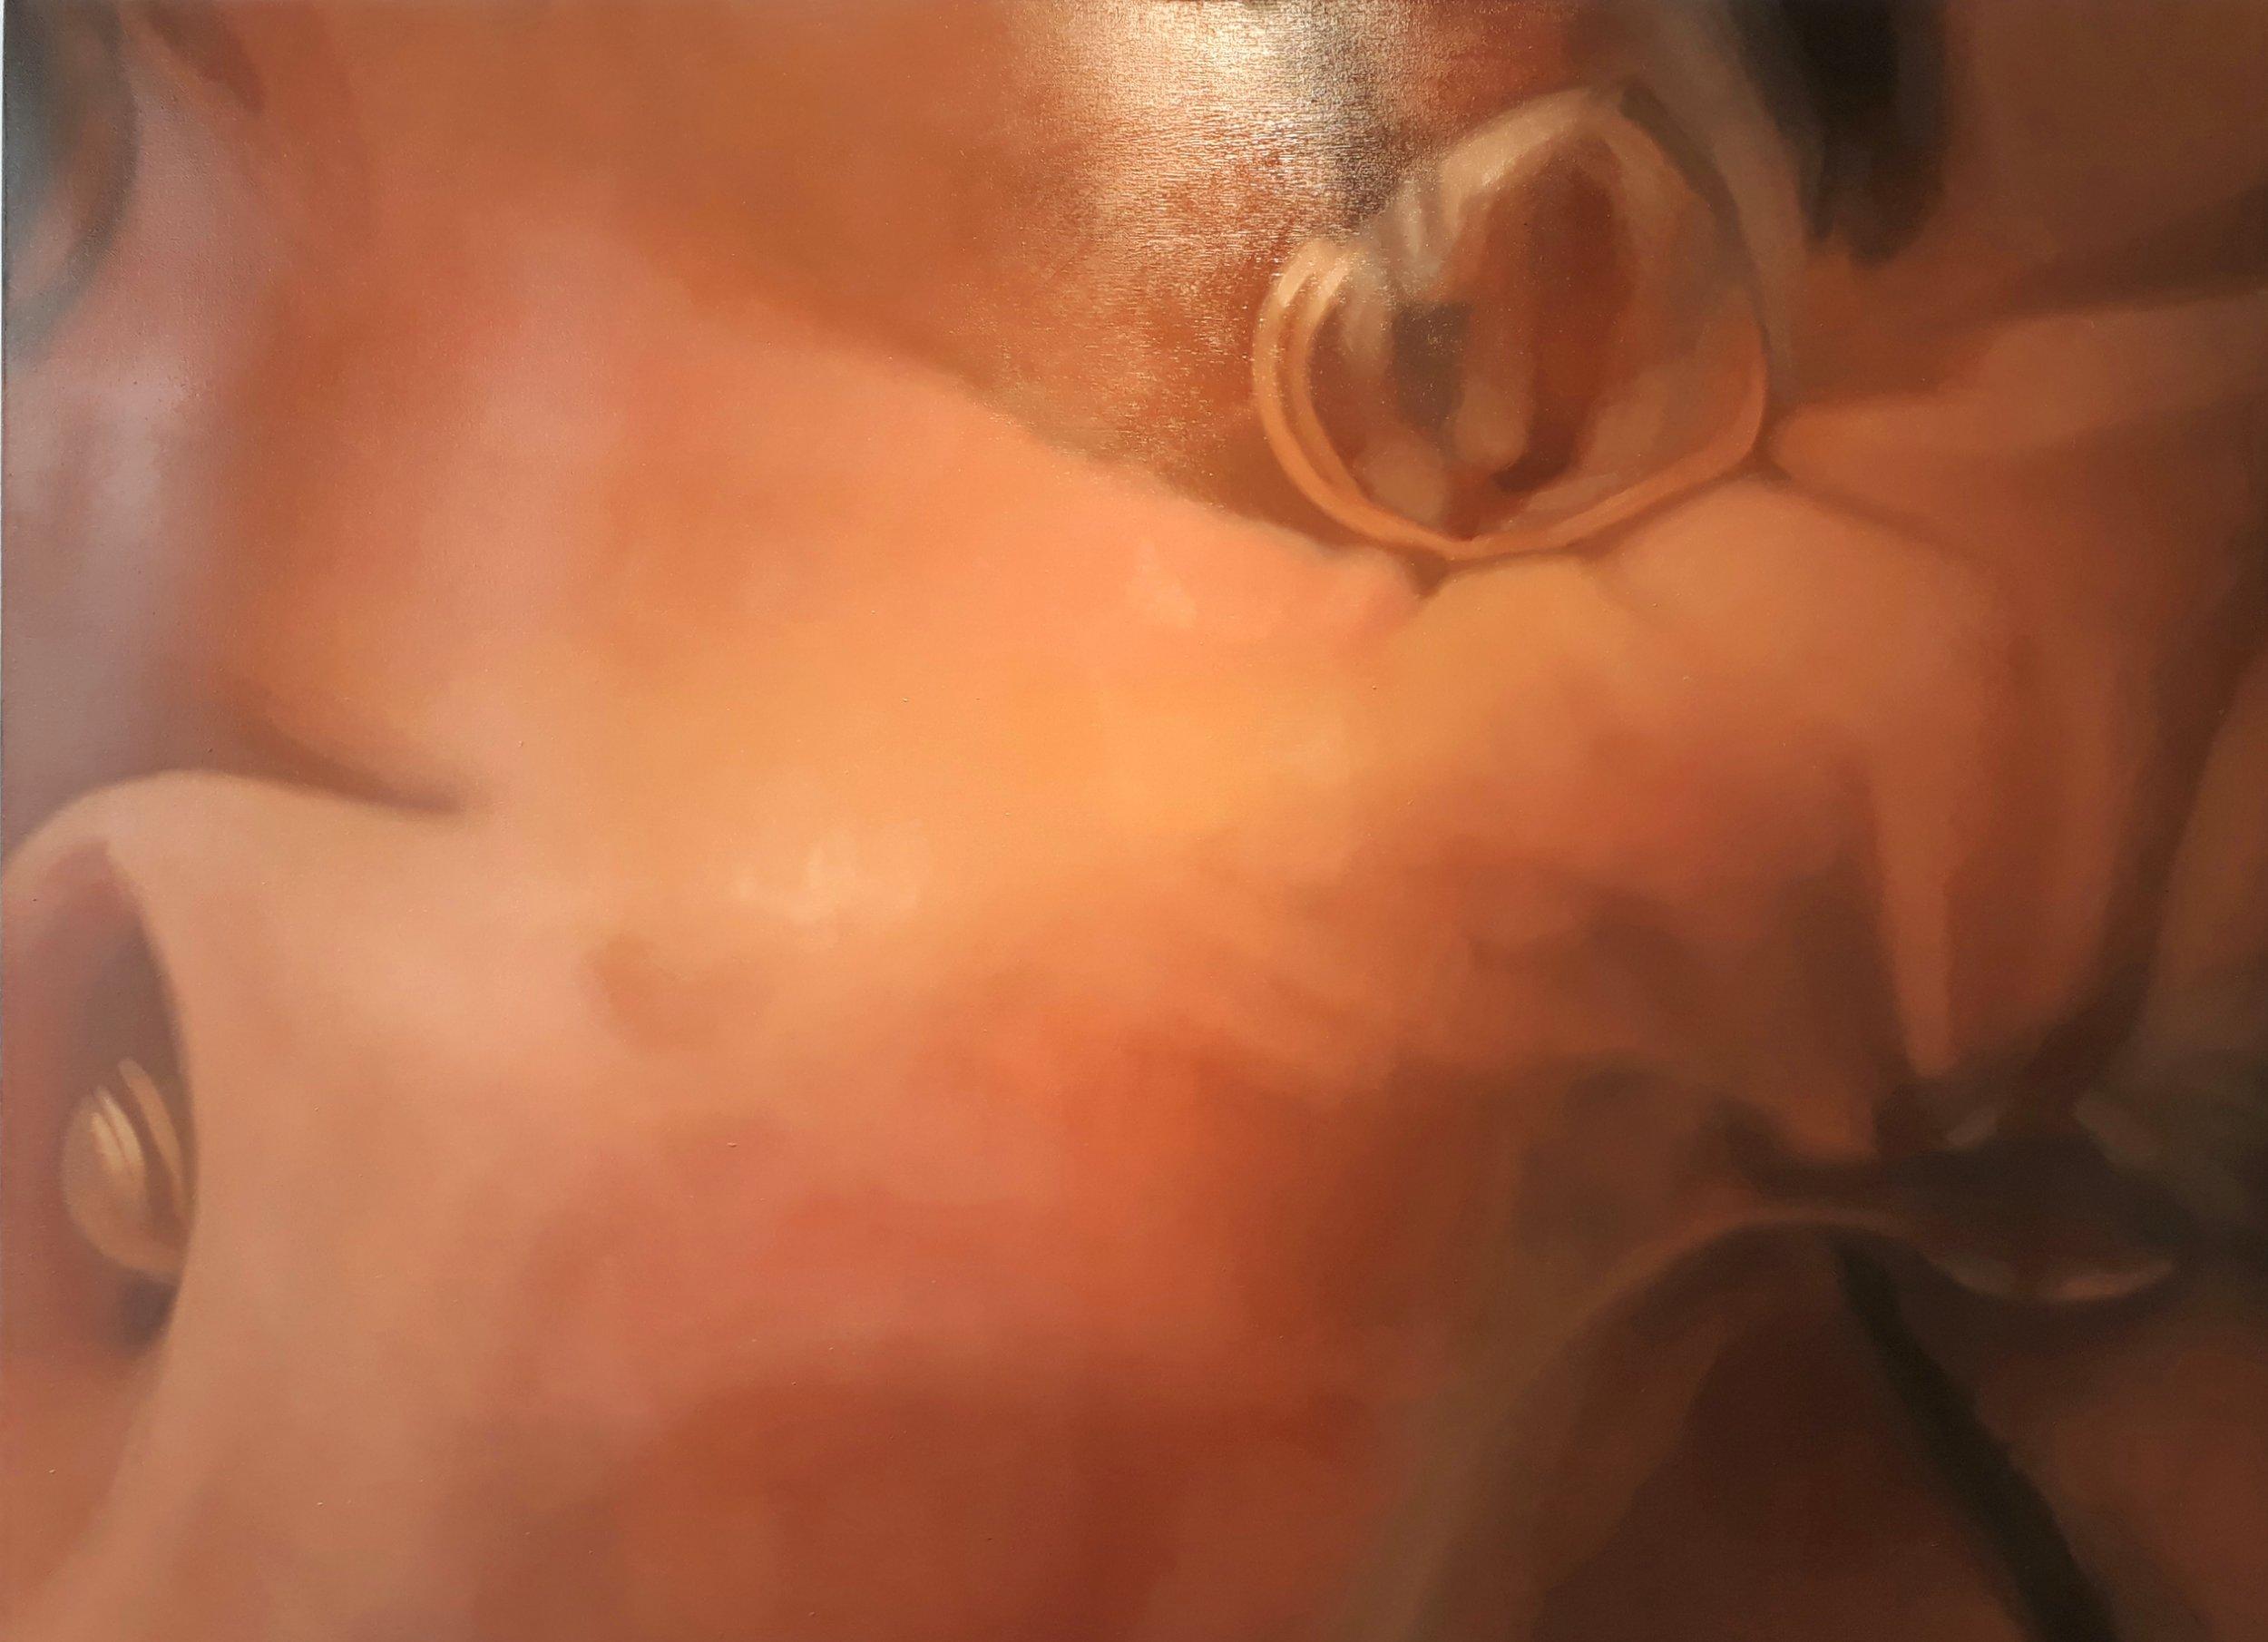 Sumersión 2 (2019) - 130 x 95 cm - Óleo sobre lienzo / Oil  painting on canvas